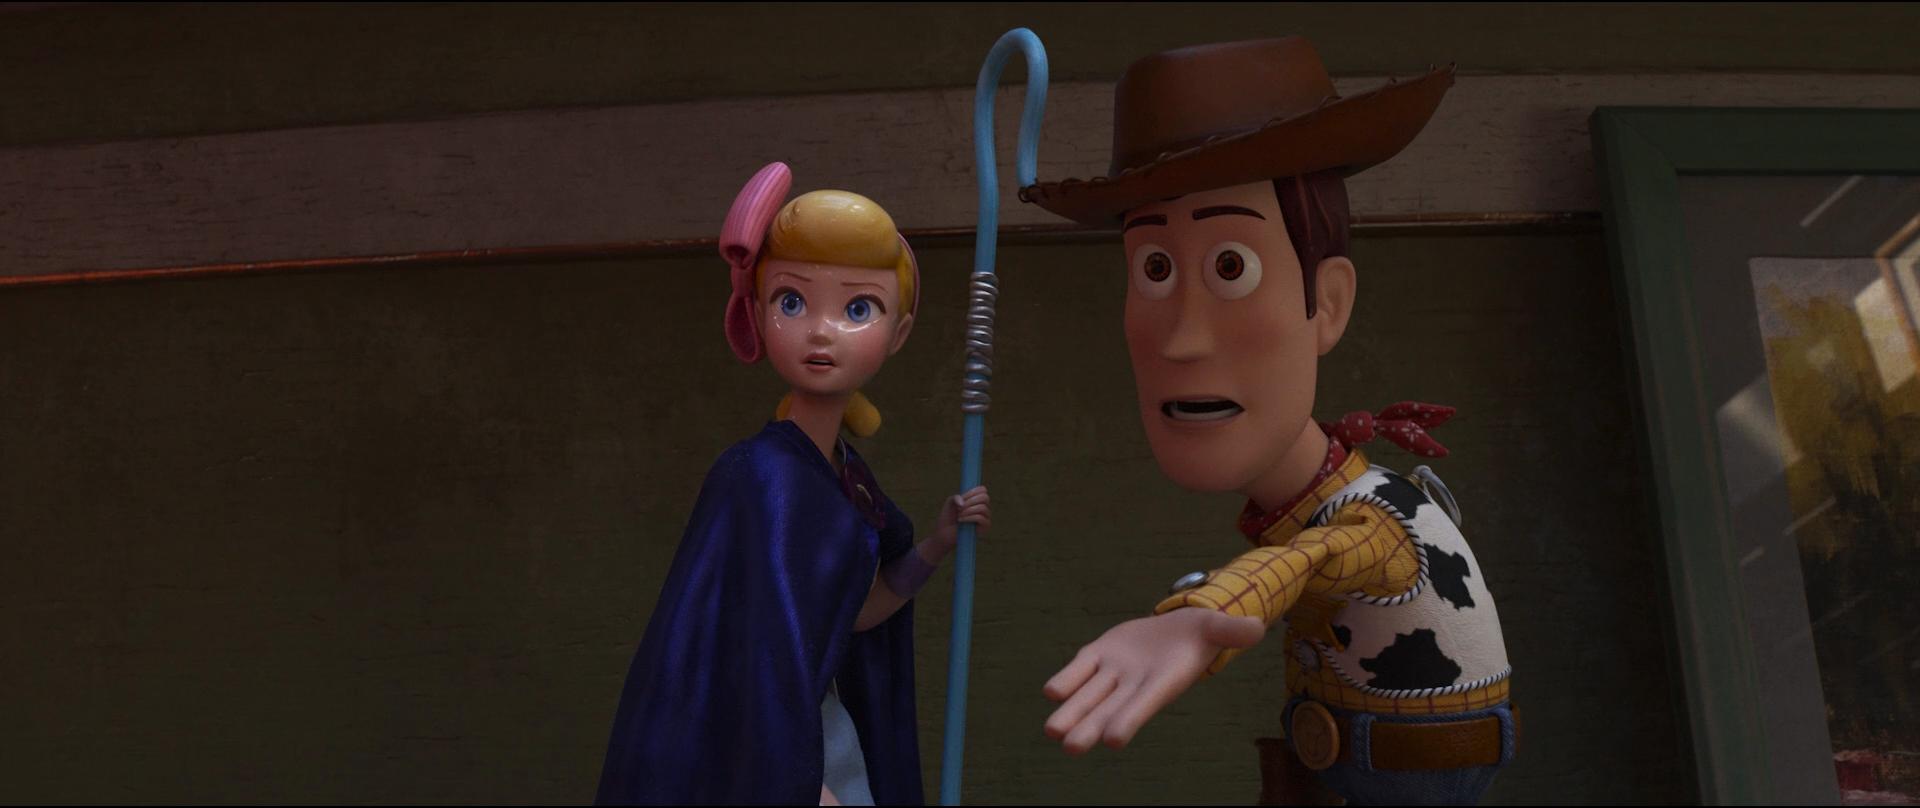 Toy Story Movies Collection 1995-2019 1080p BluRay x264 - LameyHost المجموعة الكاملة مدبلجة للغة العربية تحميل تورنت 11 arabp2p.com